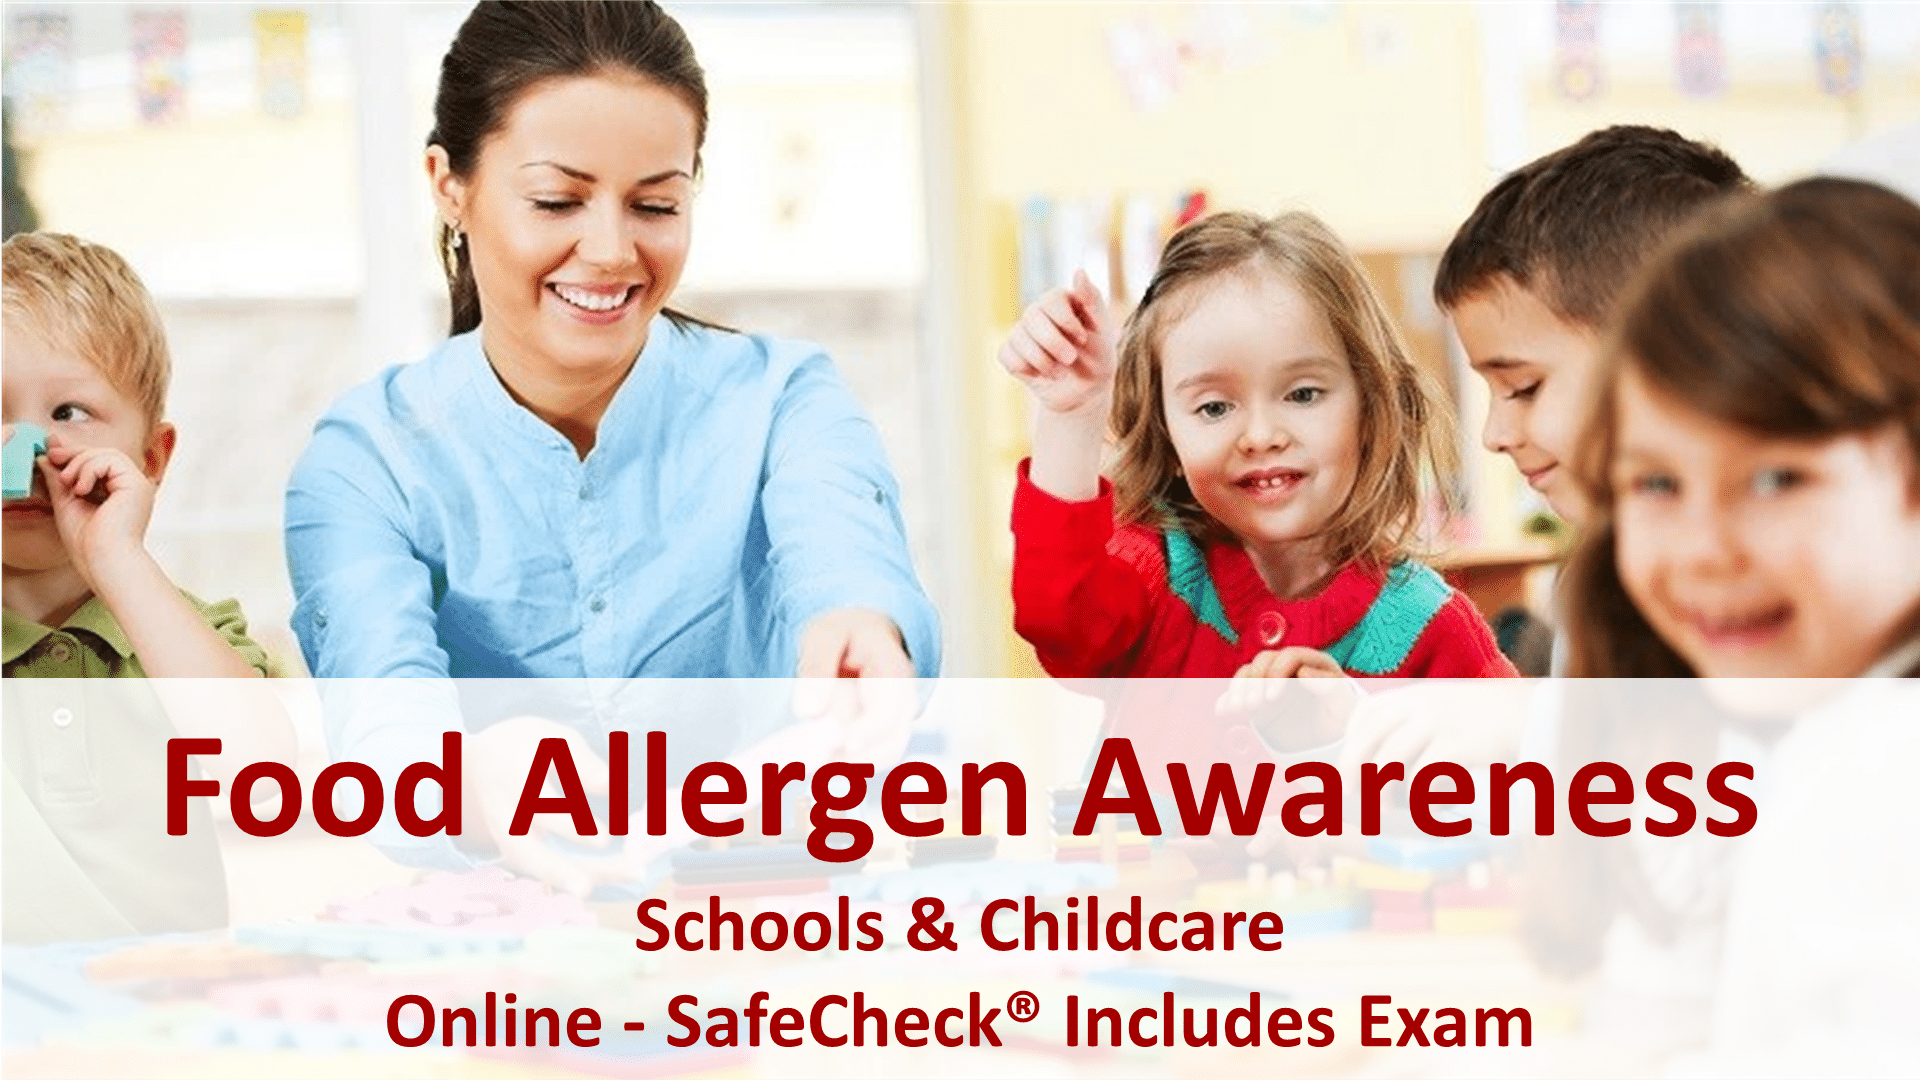 Food Allergen Awareness for Schools and Childcare